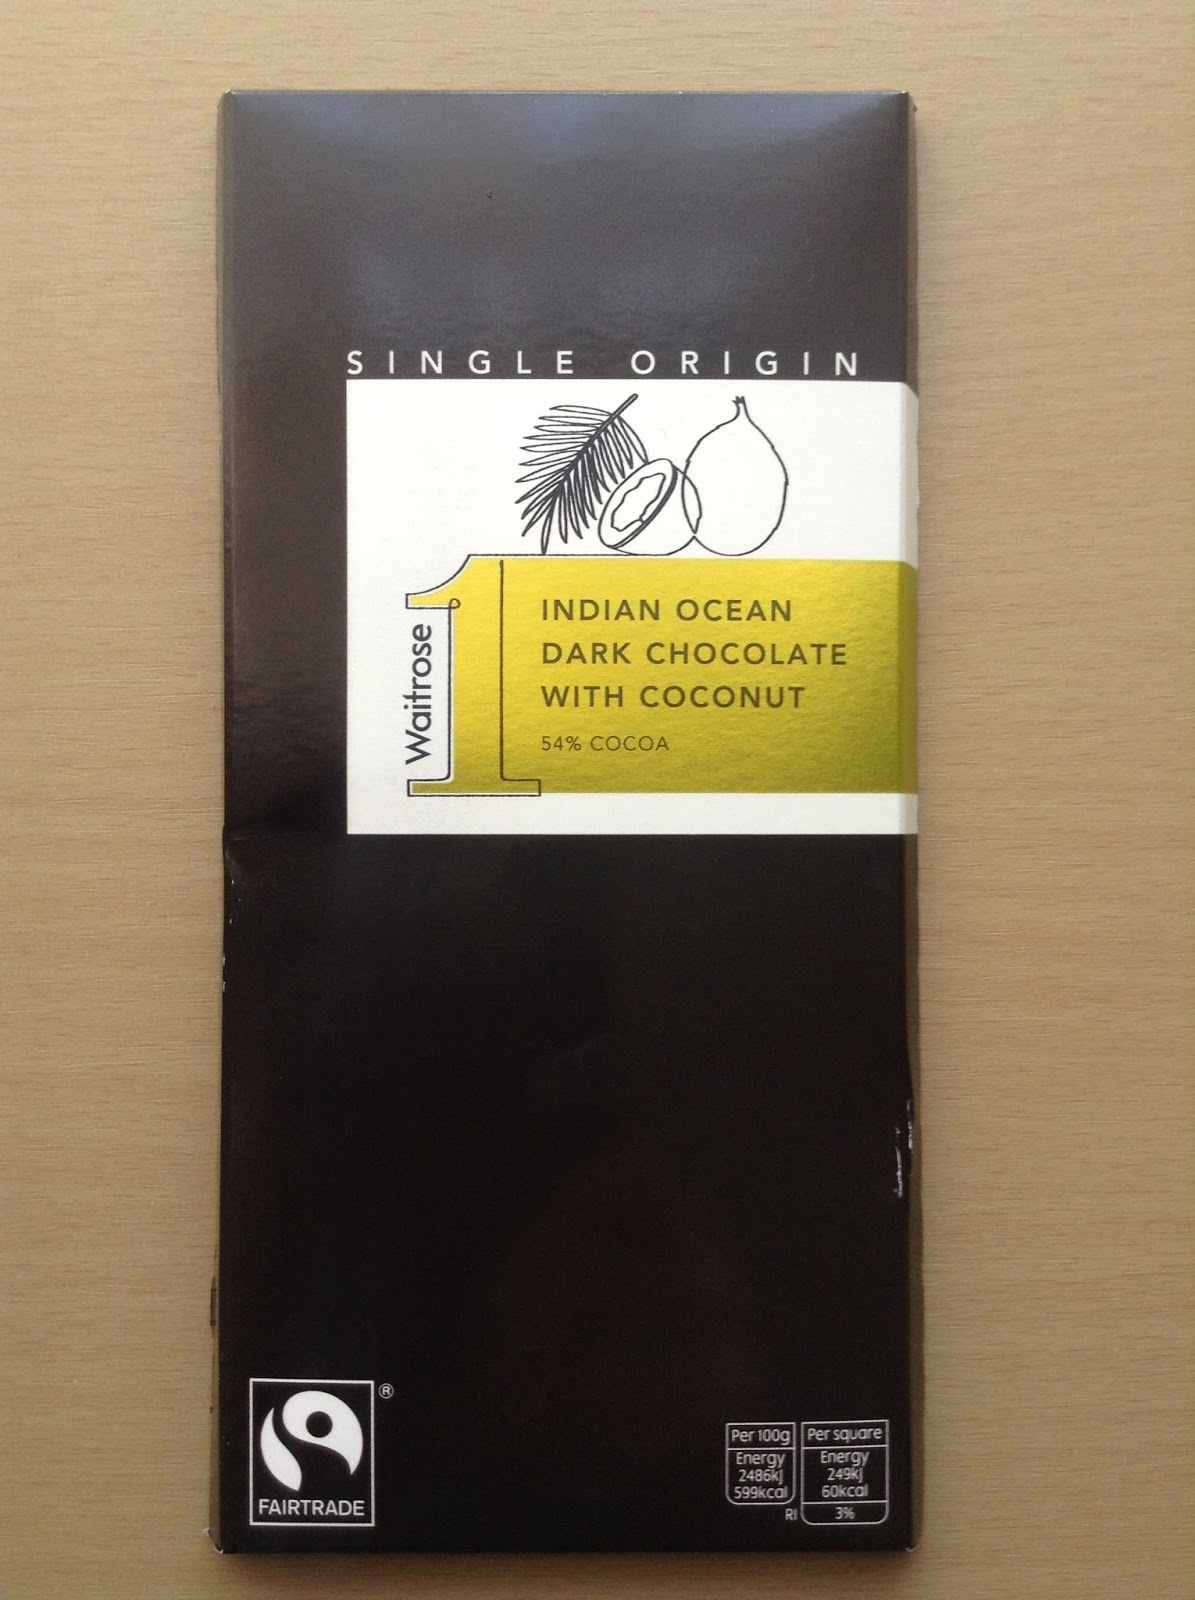 waitrose 1 indian ocean dark chocolate with coconut.JPG